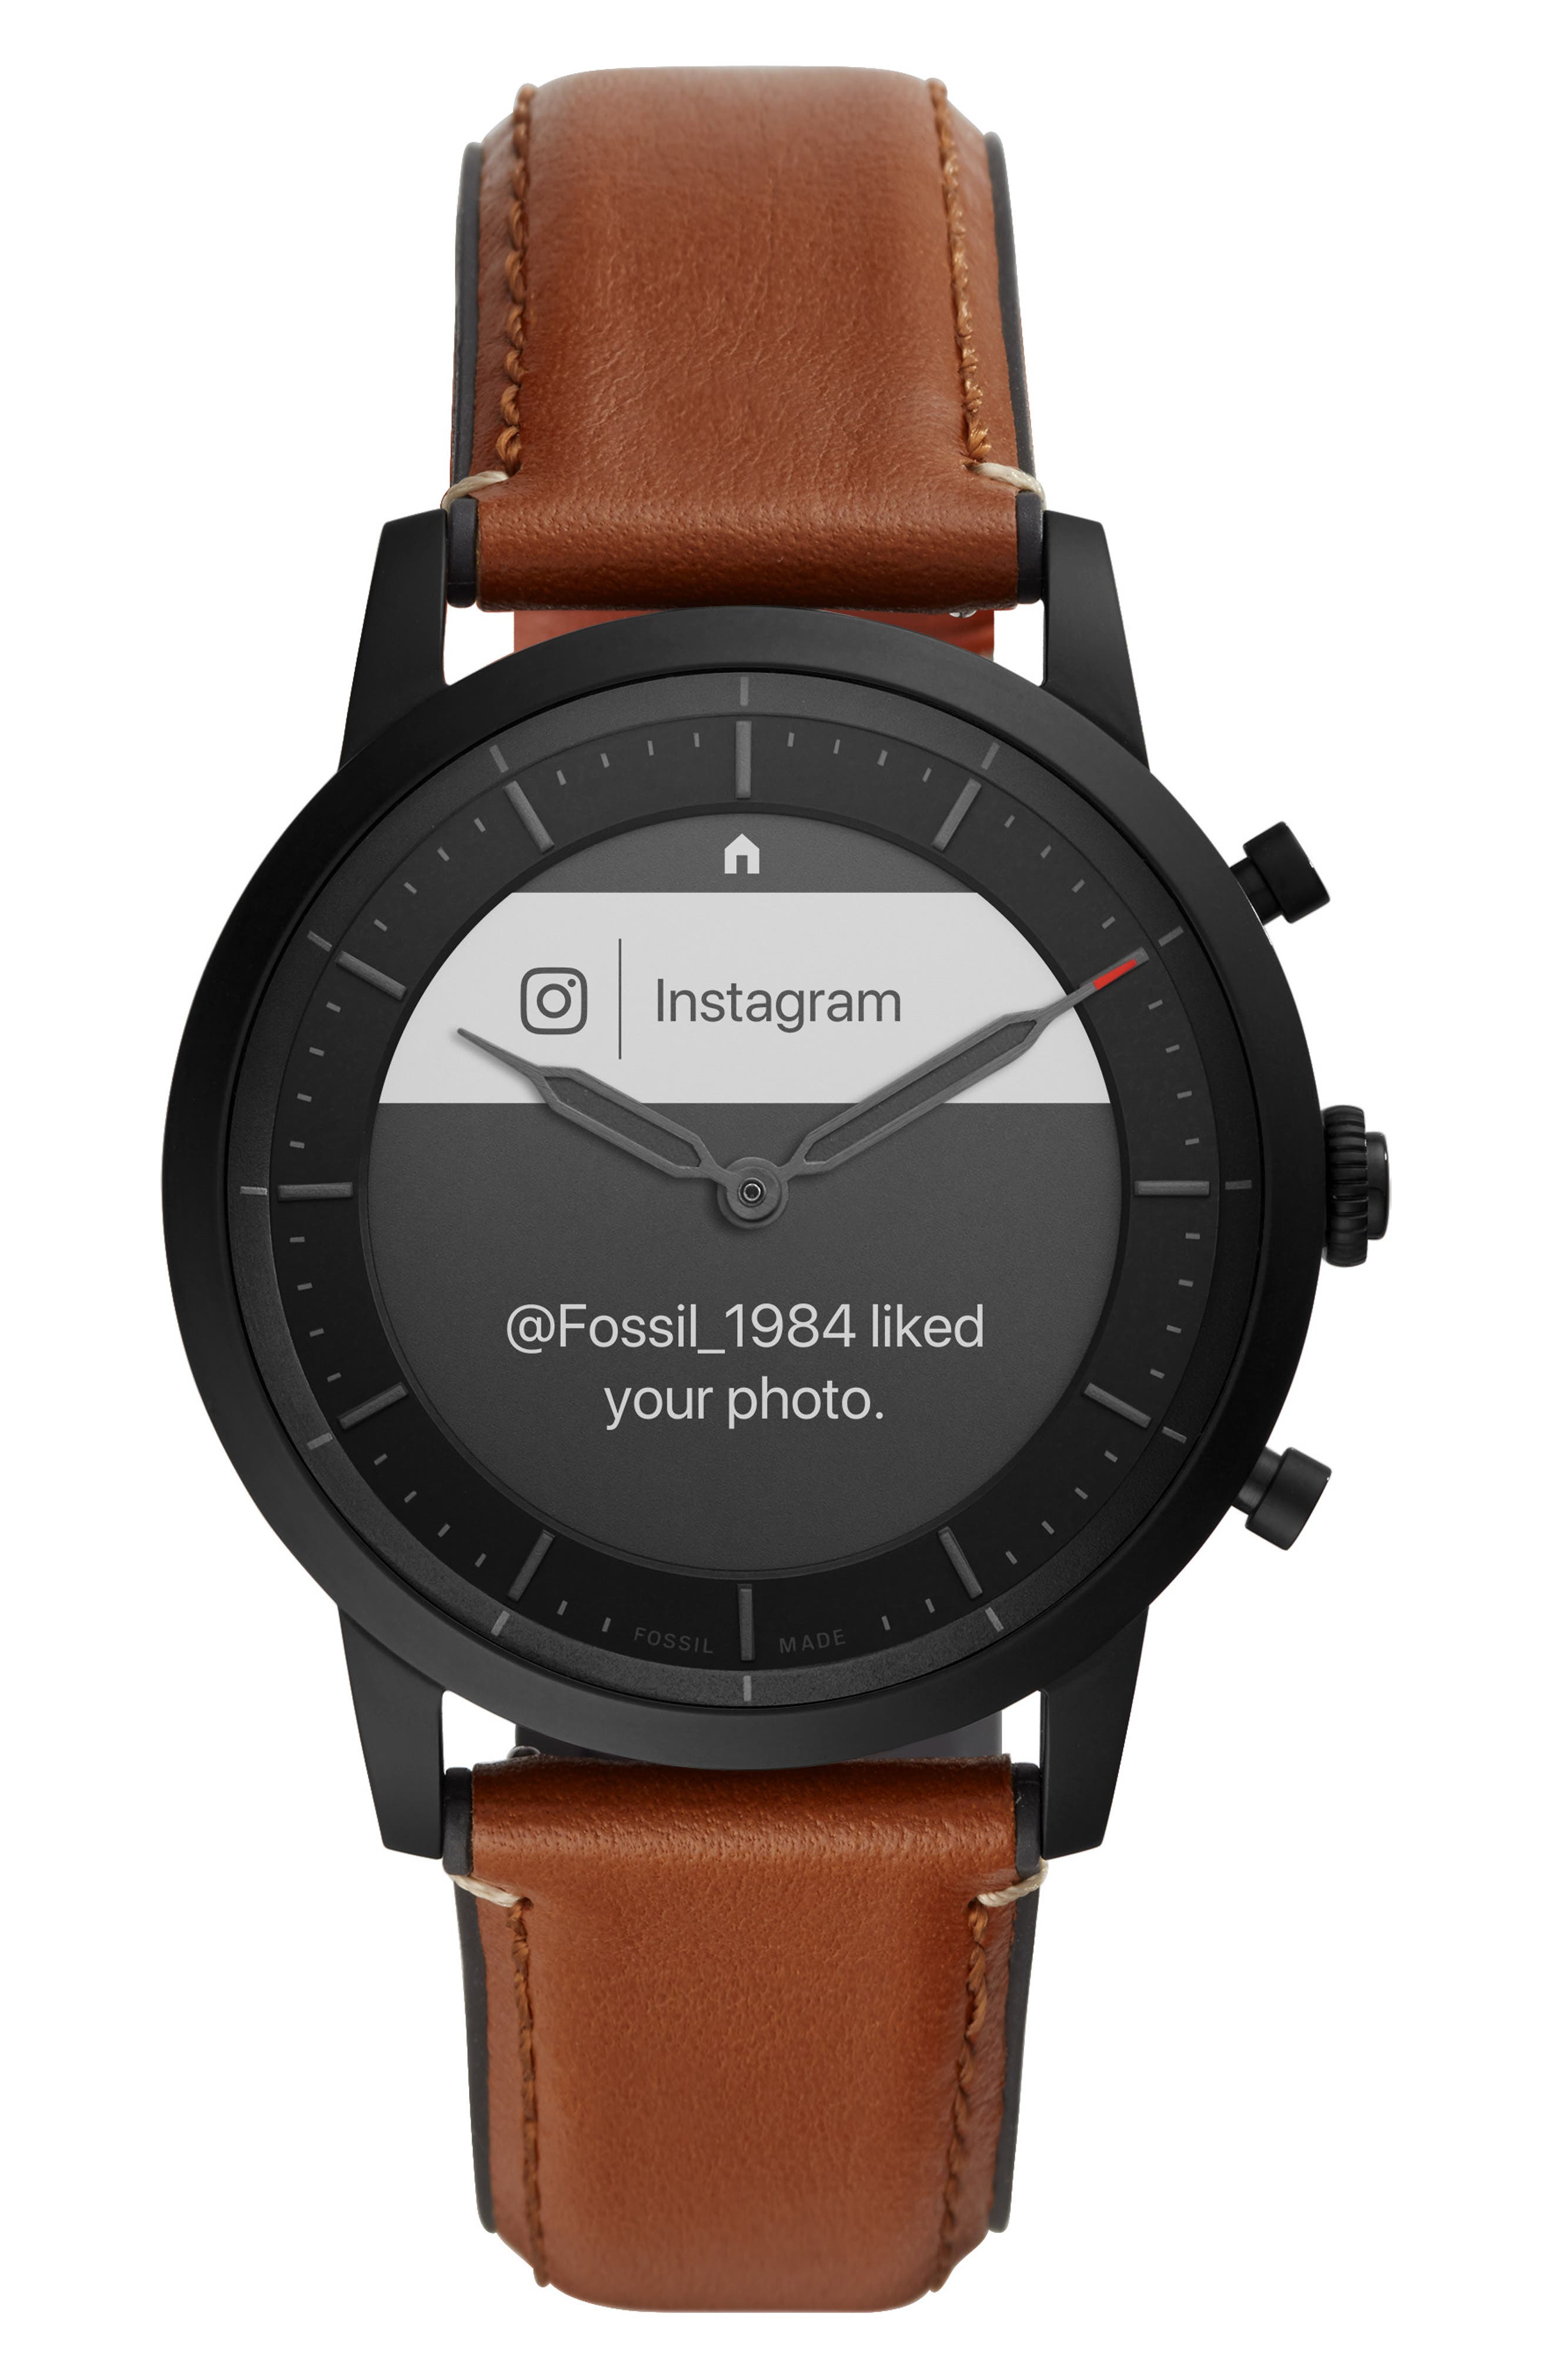 Collider Hybrid Hr Chronograph Leather Strap Smart Watch